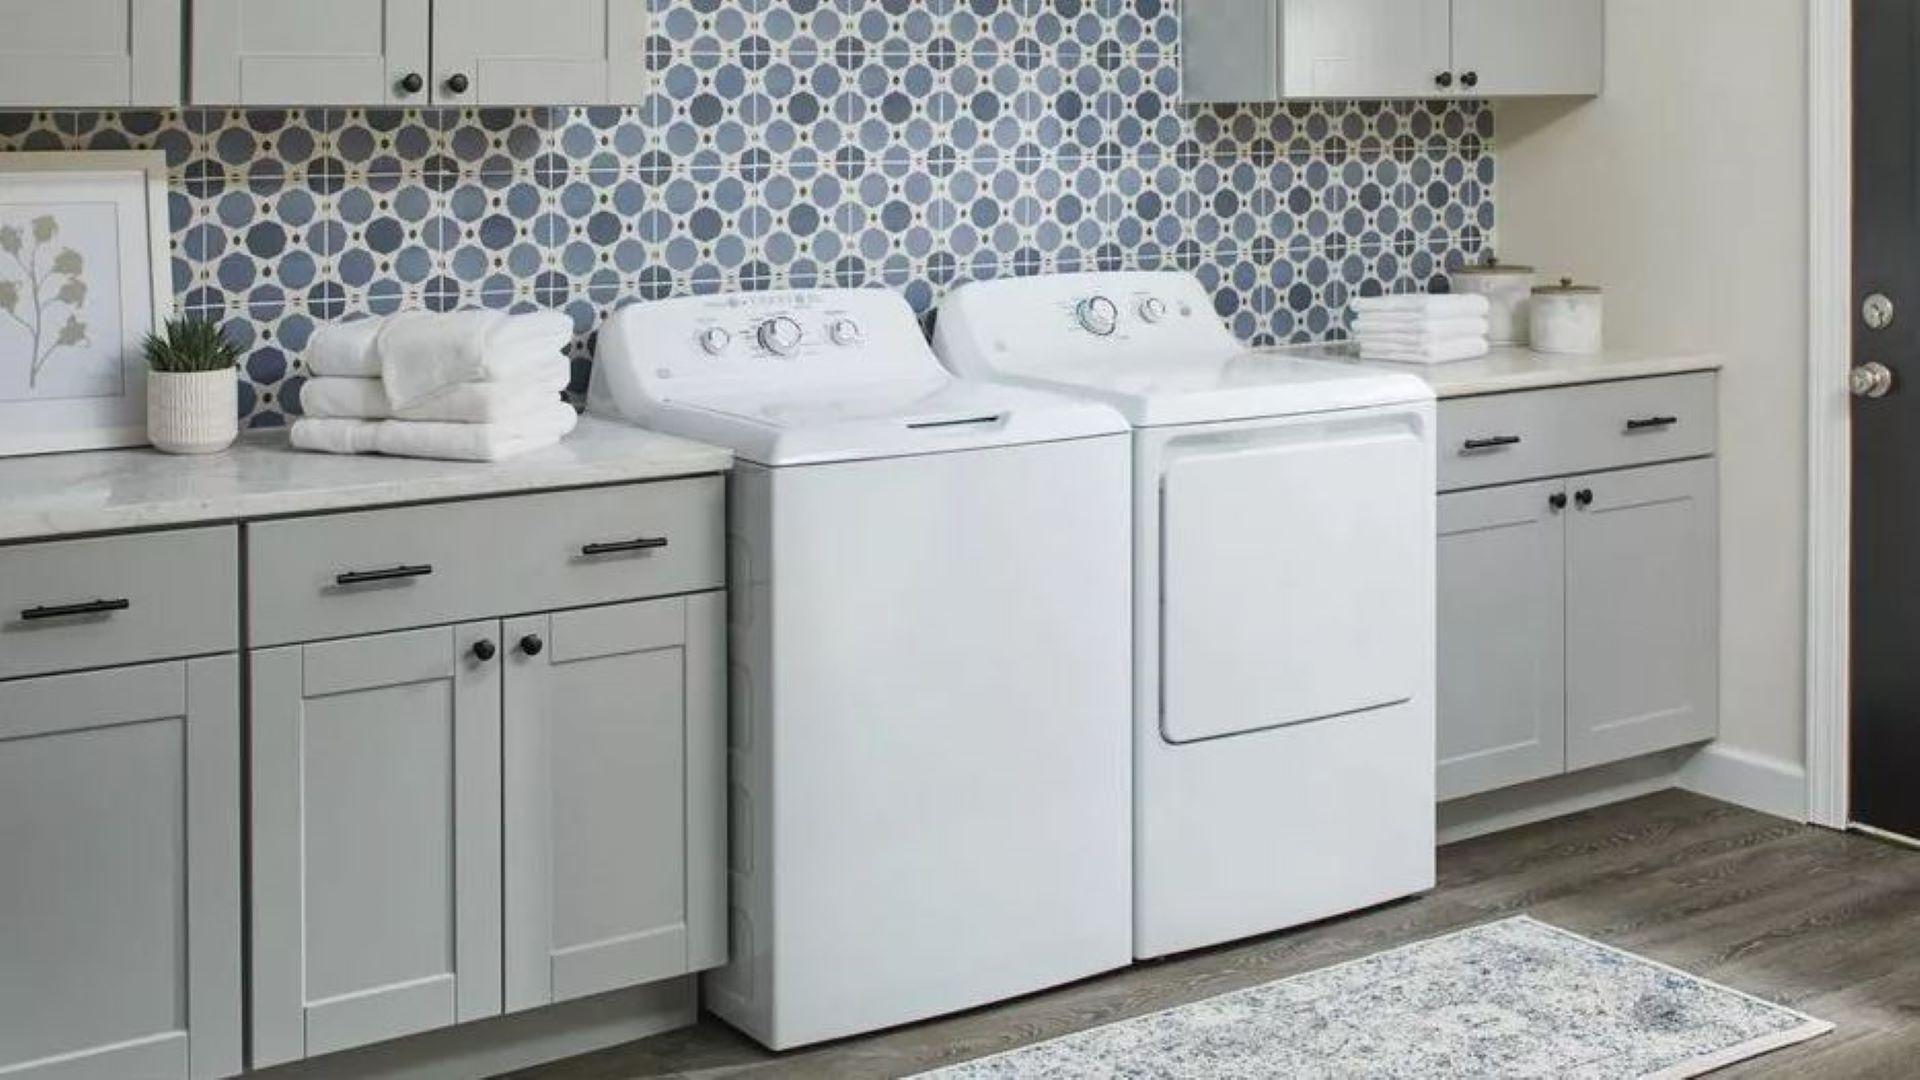 Best Top Load Washing Machines Top Ten Reviews